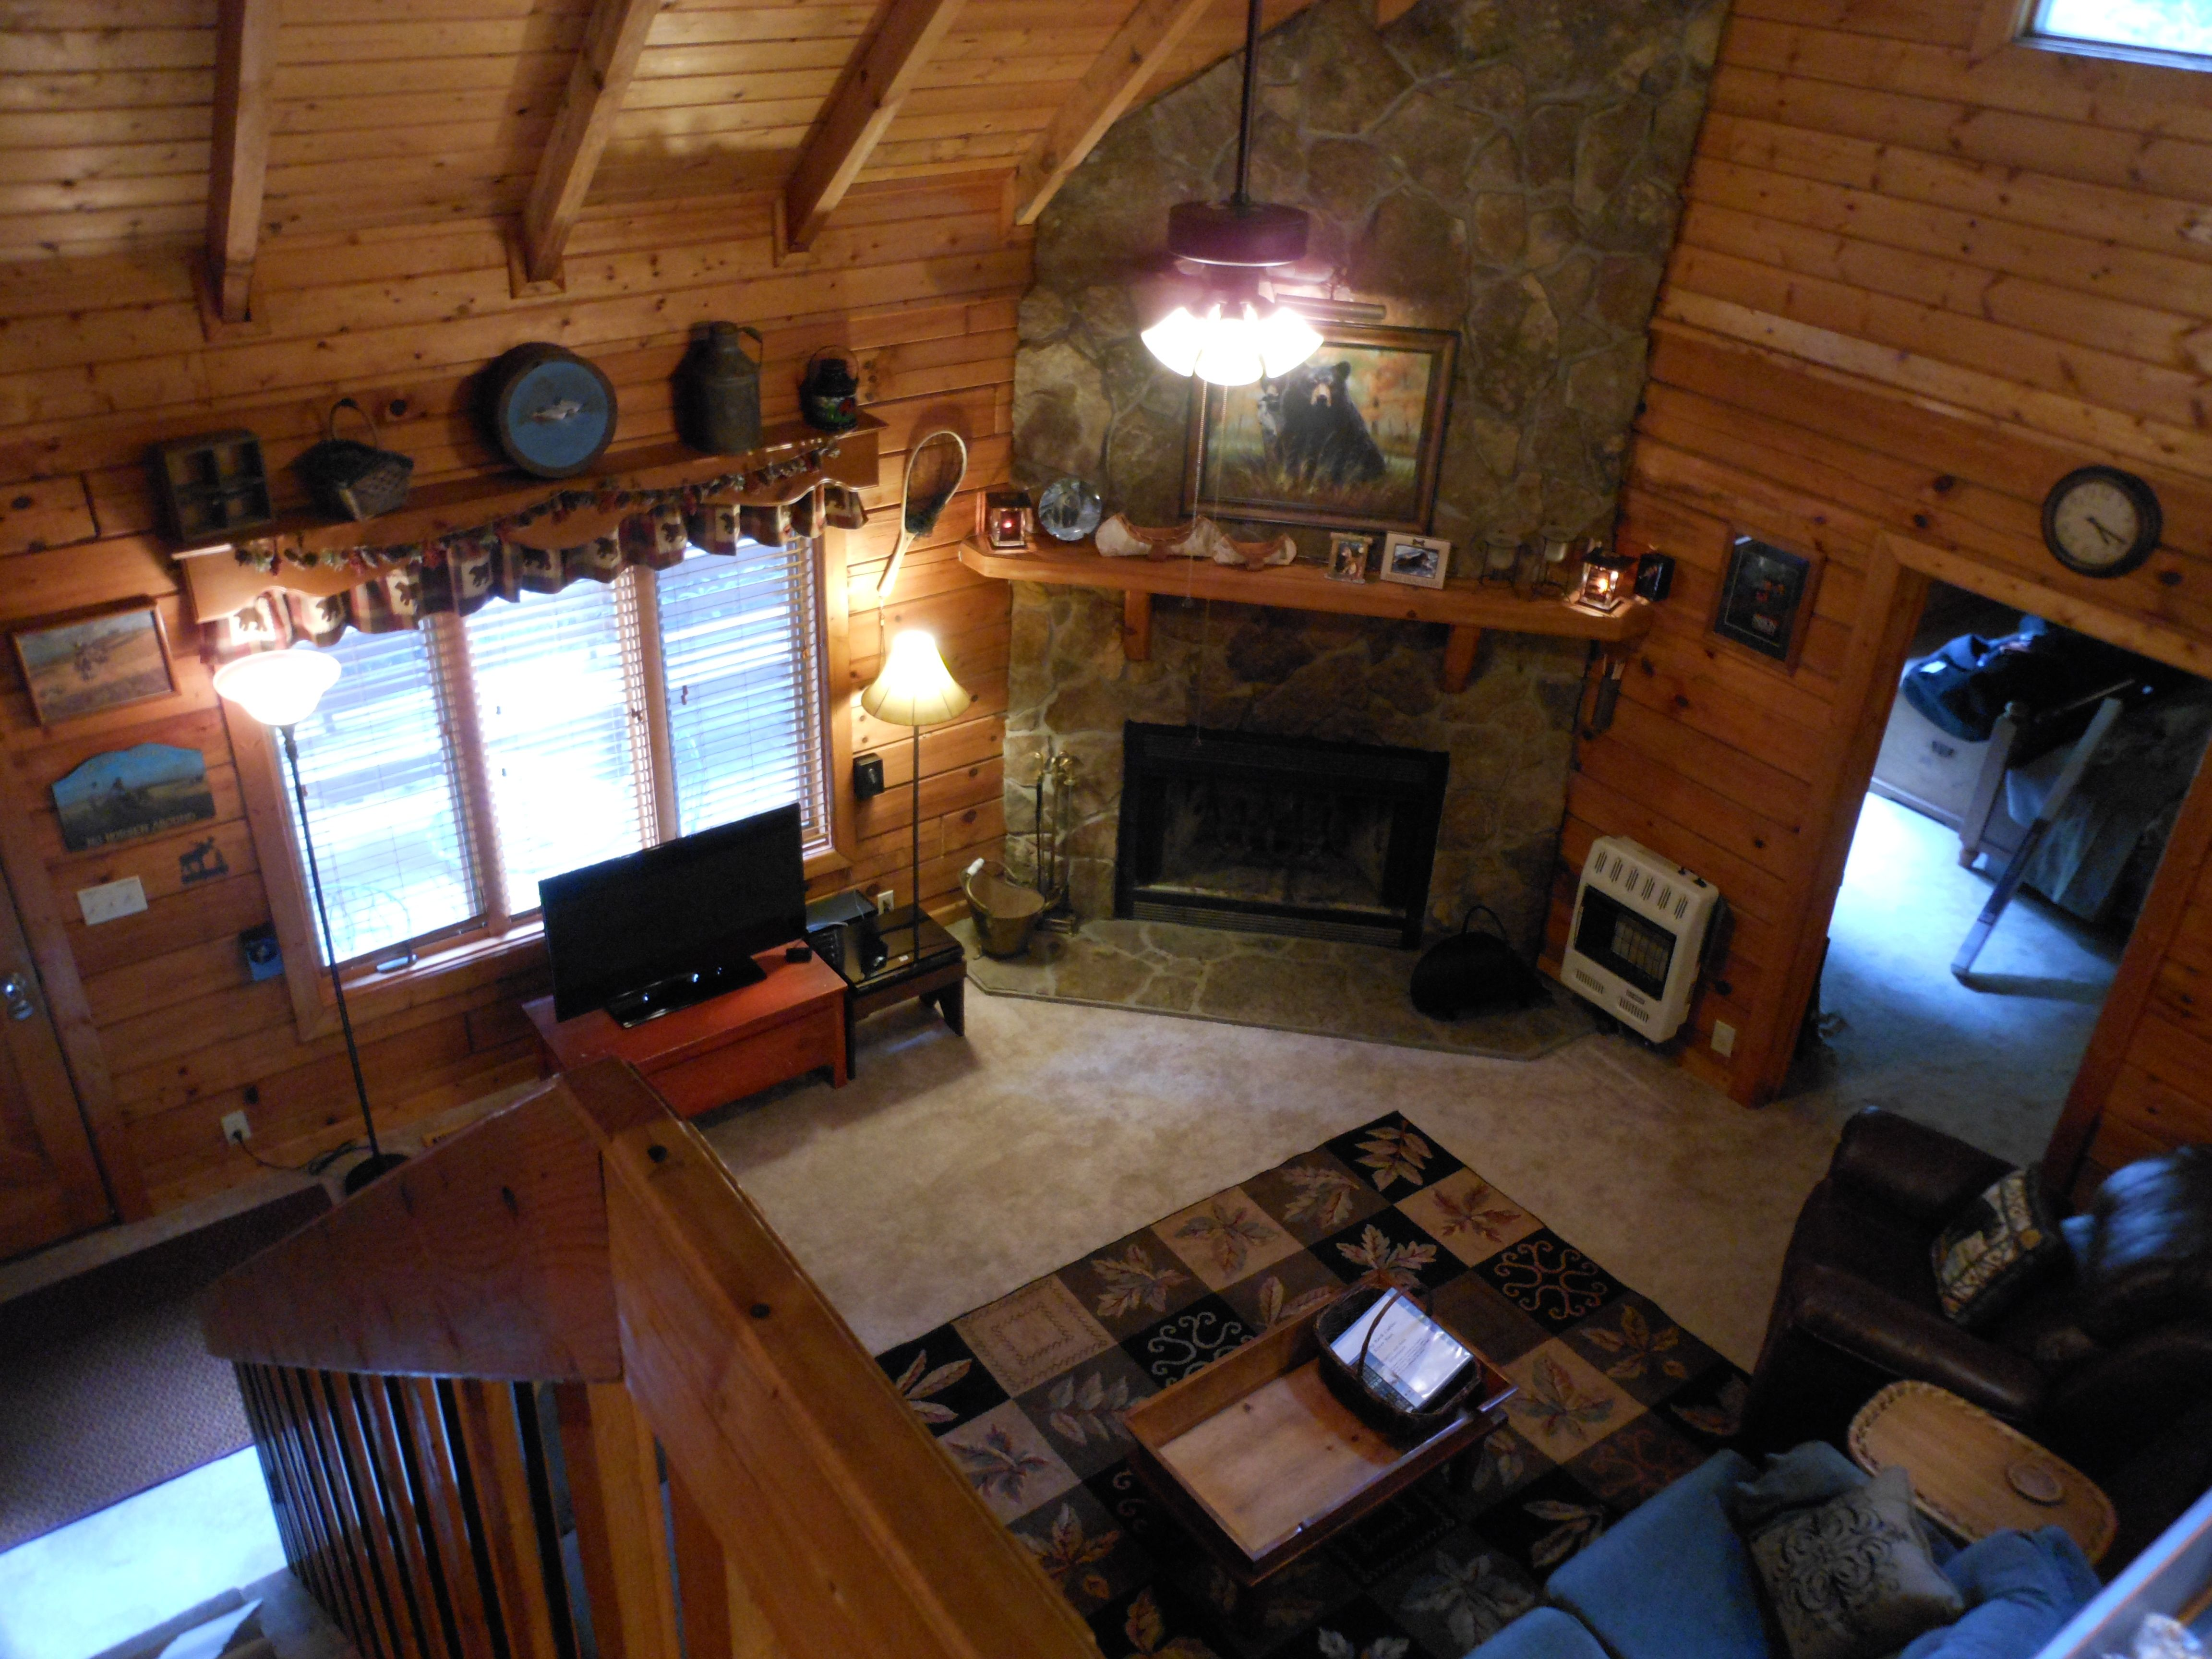 trout cabin pin view cabins creek mountaintown rentals retreat ellijay wilderness ga in